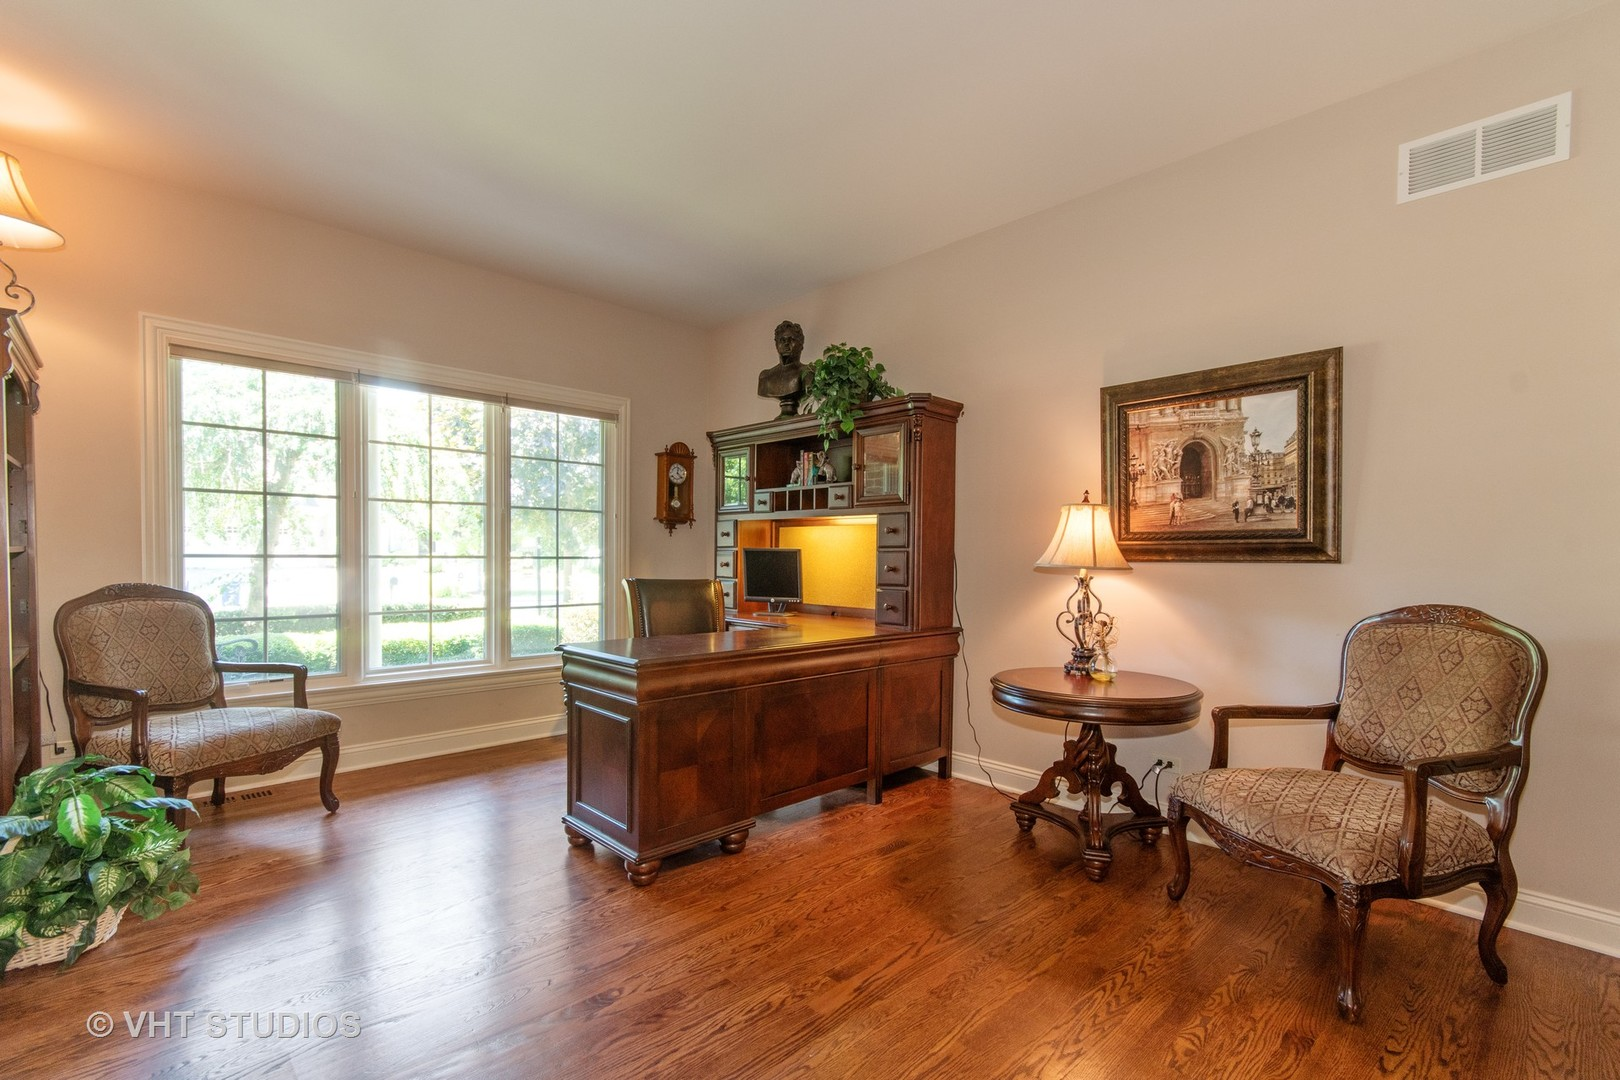 3525 Majestic Oaks, ST. CHARLES, Illinois, 60174